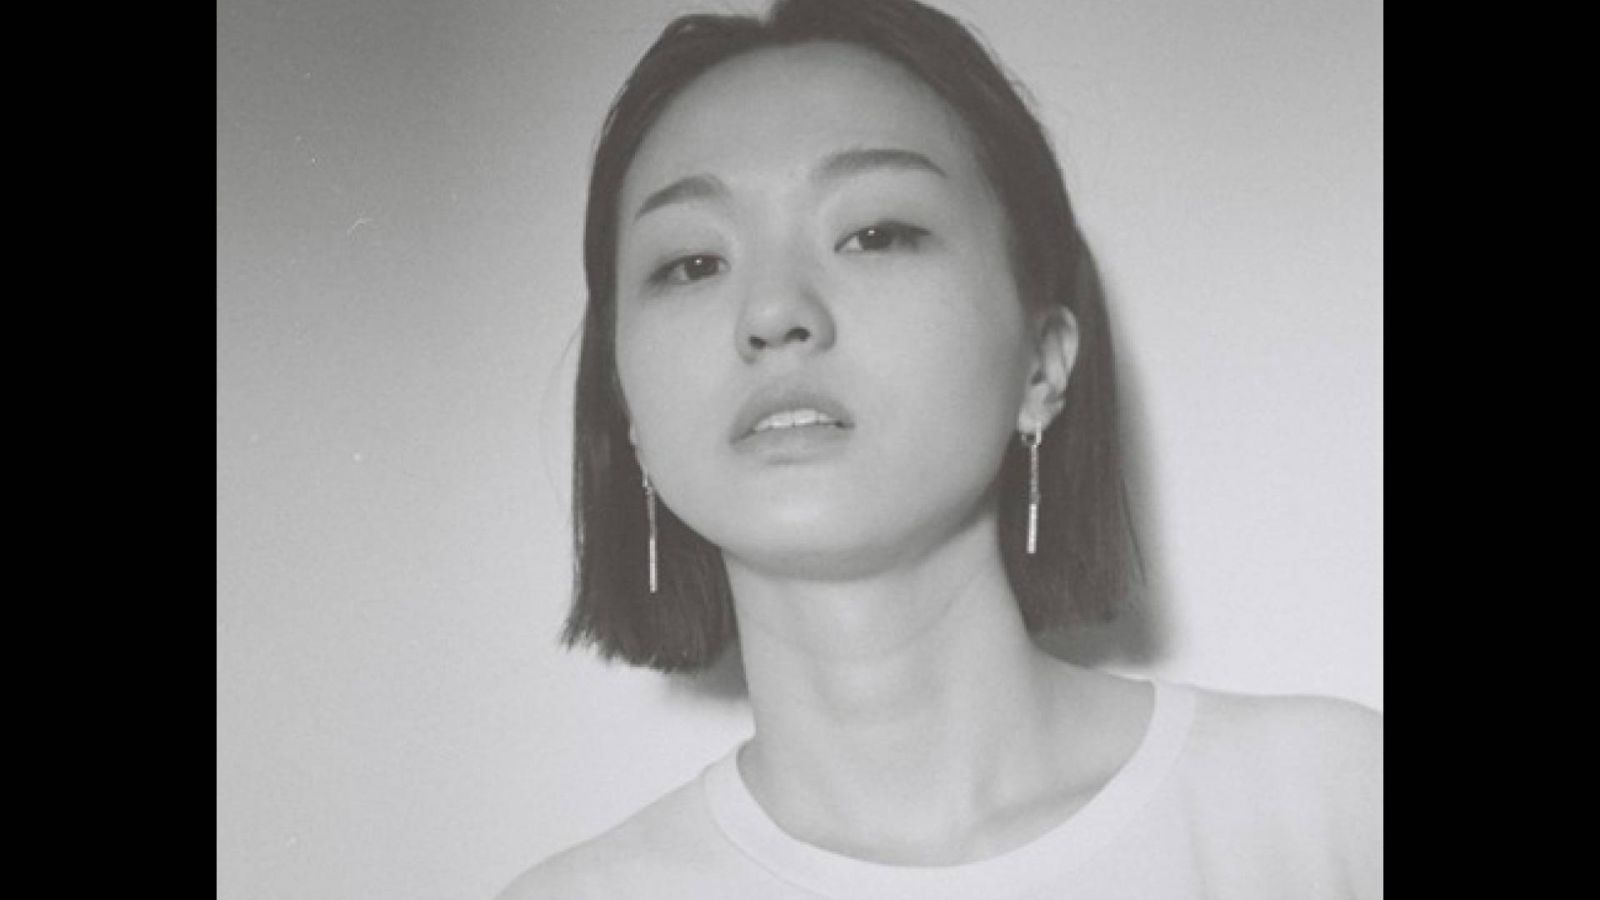 Nouseva house-artisti Park Hye Jin esiintyy Helsingissä © 박혜진 park hye jin. All rights reserved.